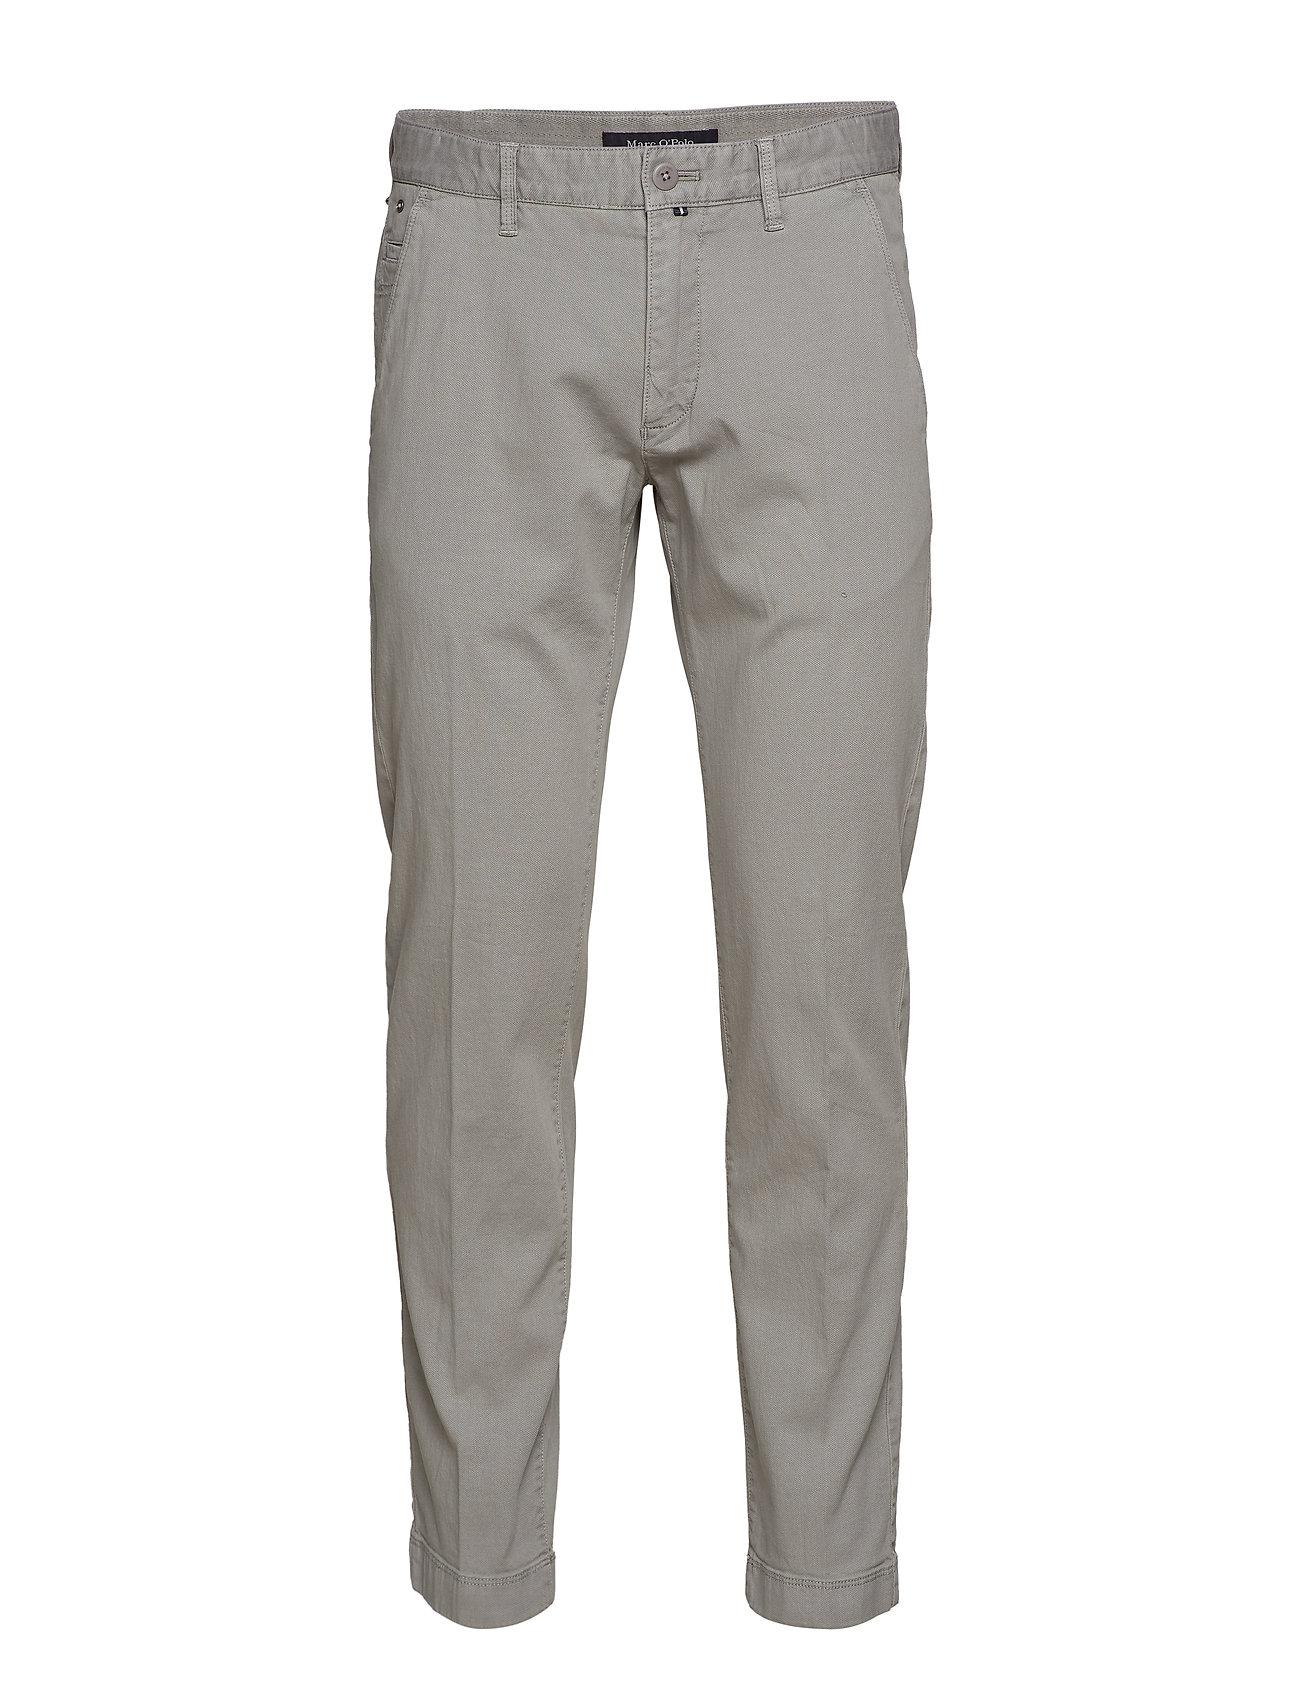 Marc O'Polo Woven Pants - GRIFFIN